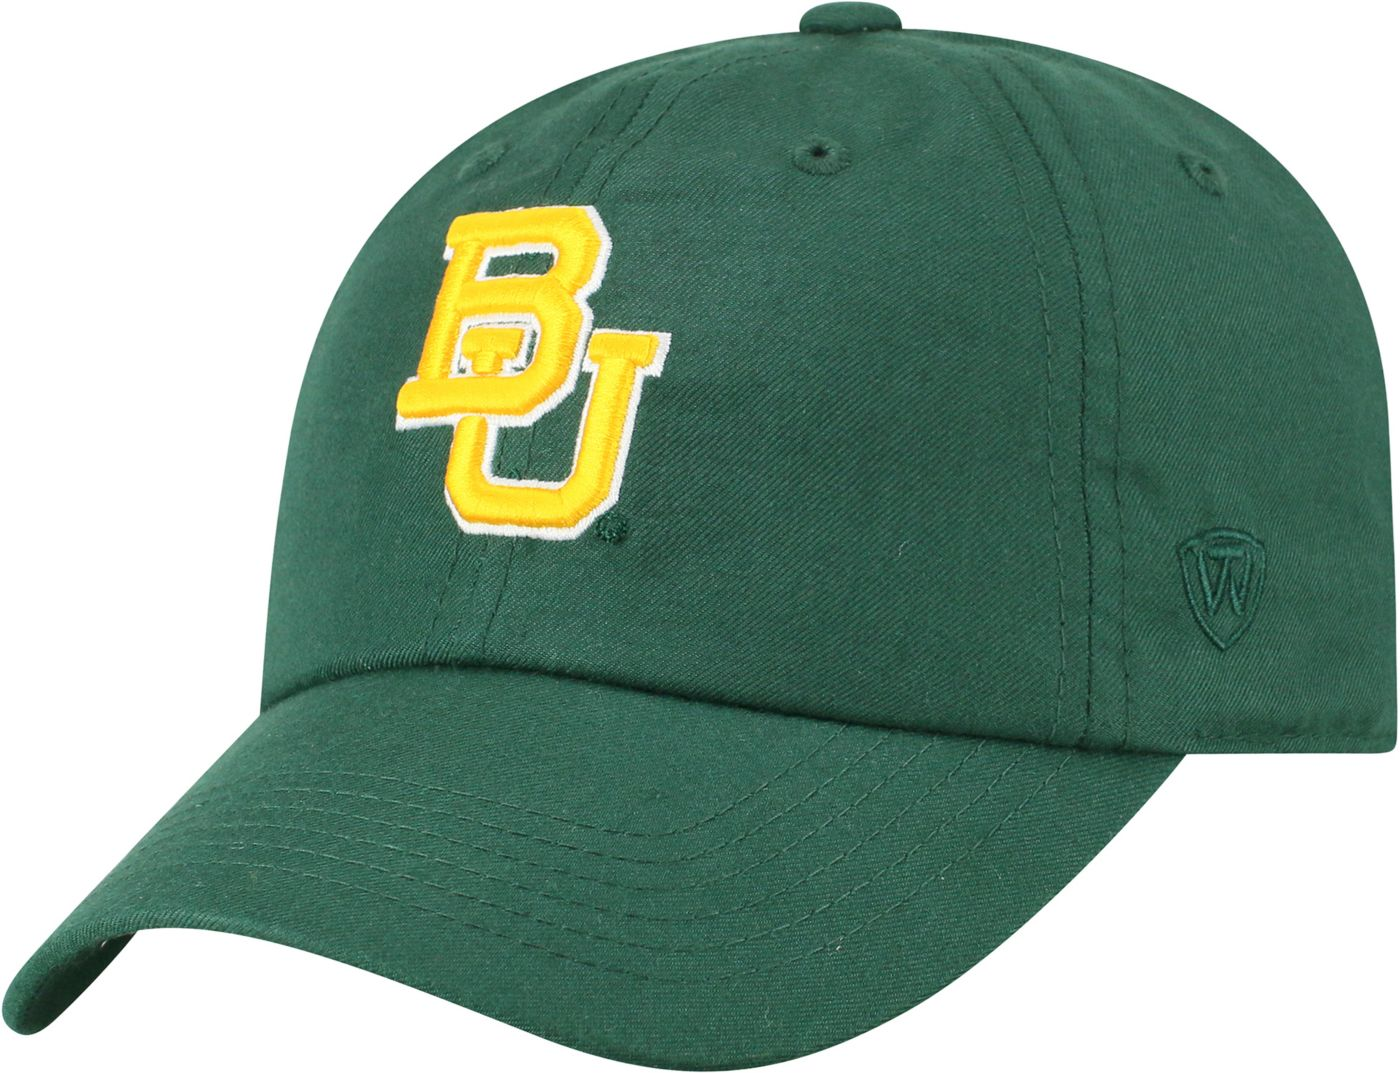 Top of the World Men's Baylor Bears Green Staple Adjustable Hat